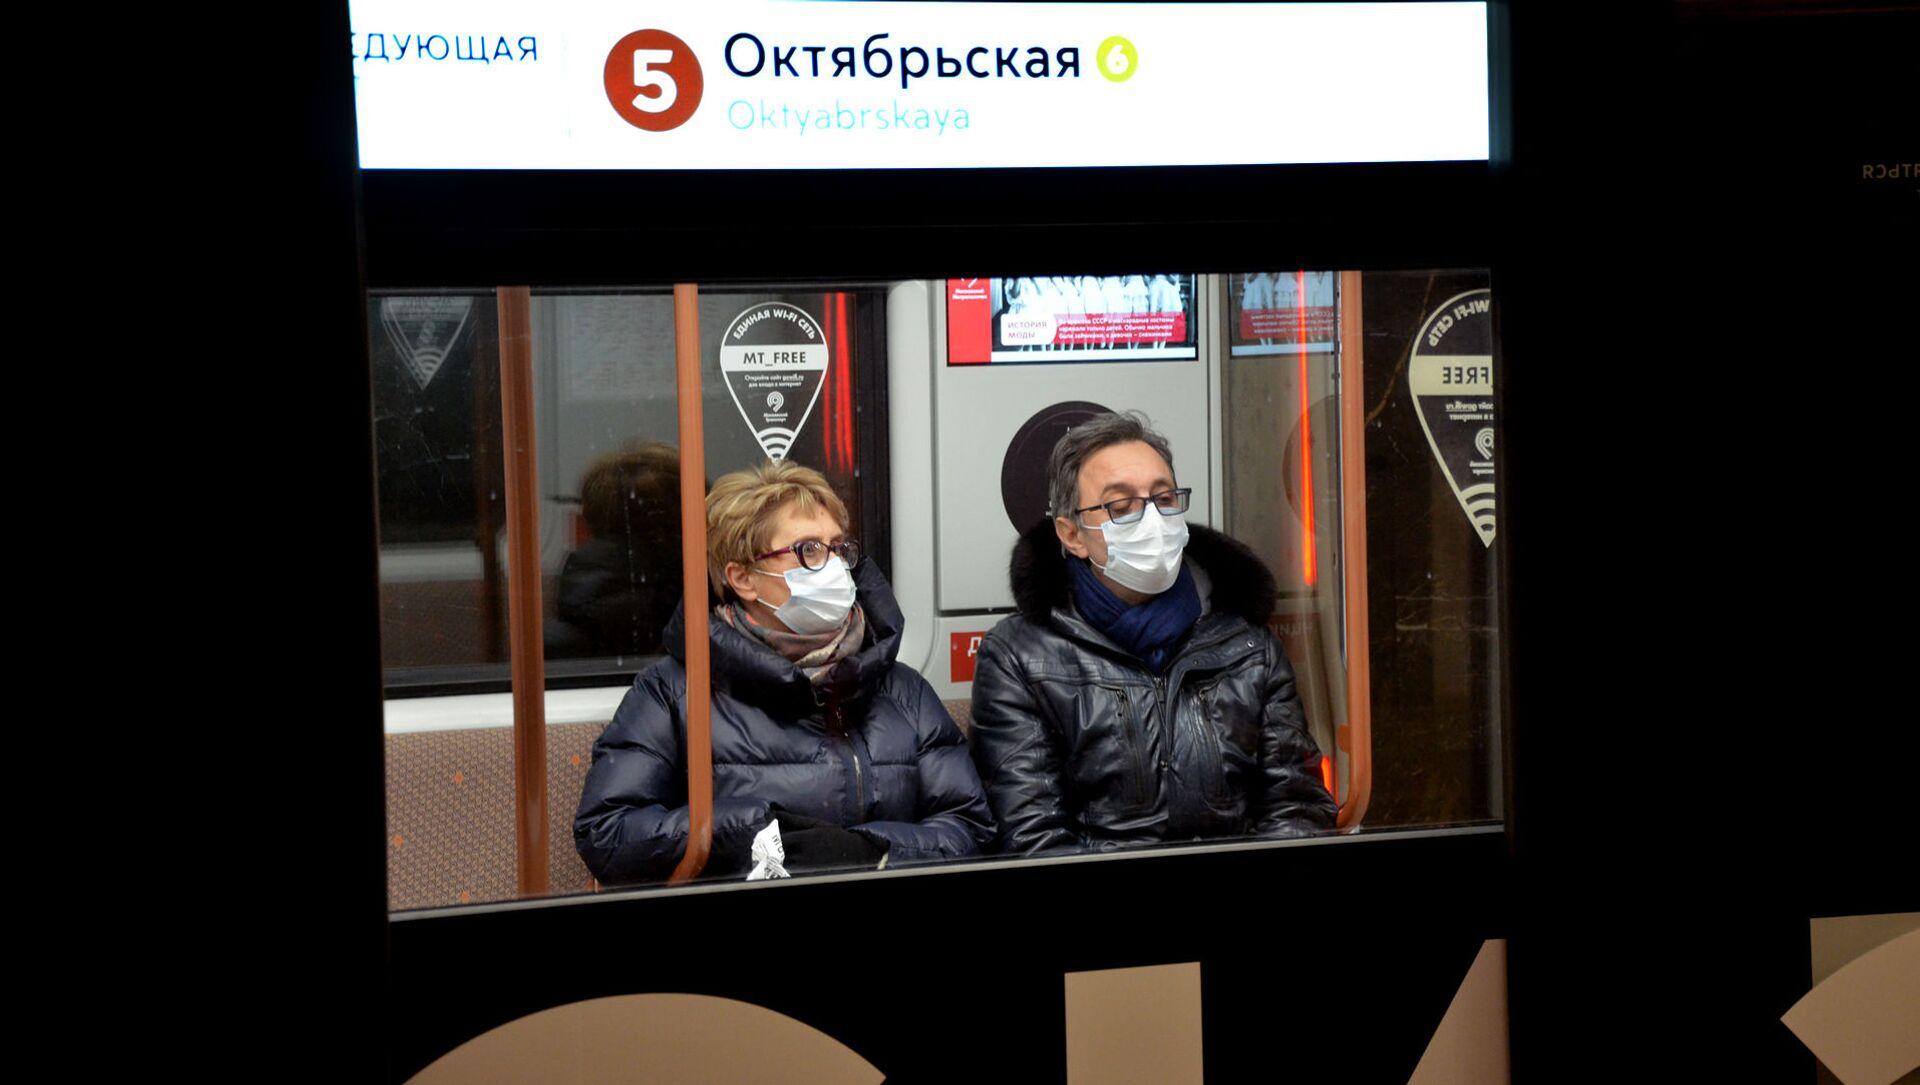 Coronavirus in Russia - Metropolitana di Mosca, gennaio 2021 - Sputnik Italia, 1920, 07.02.2021